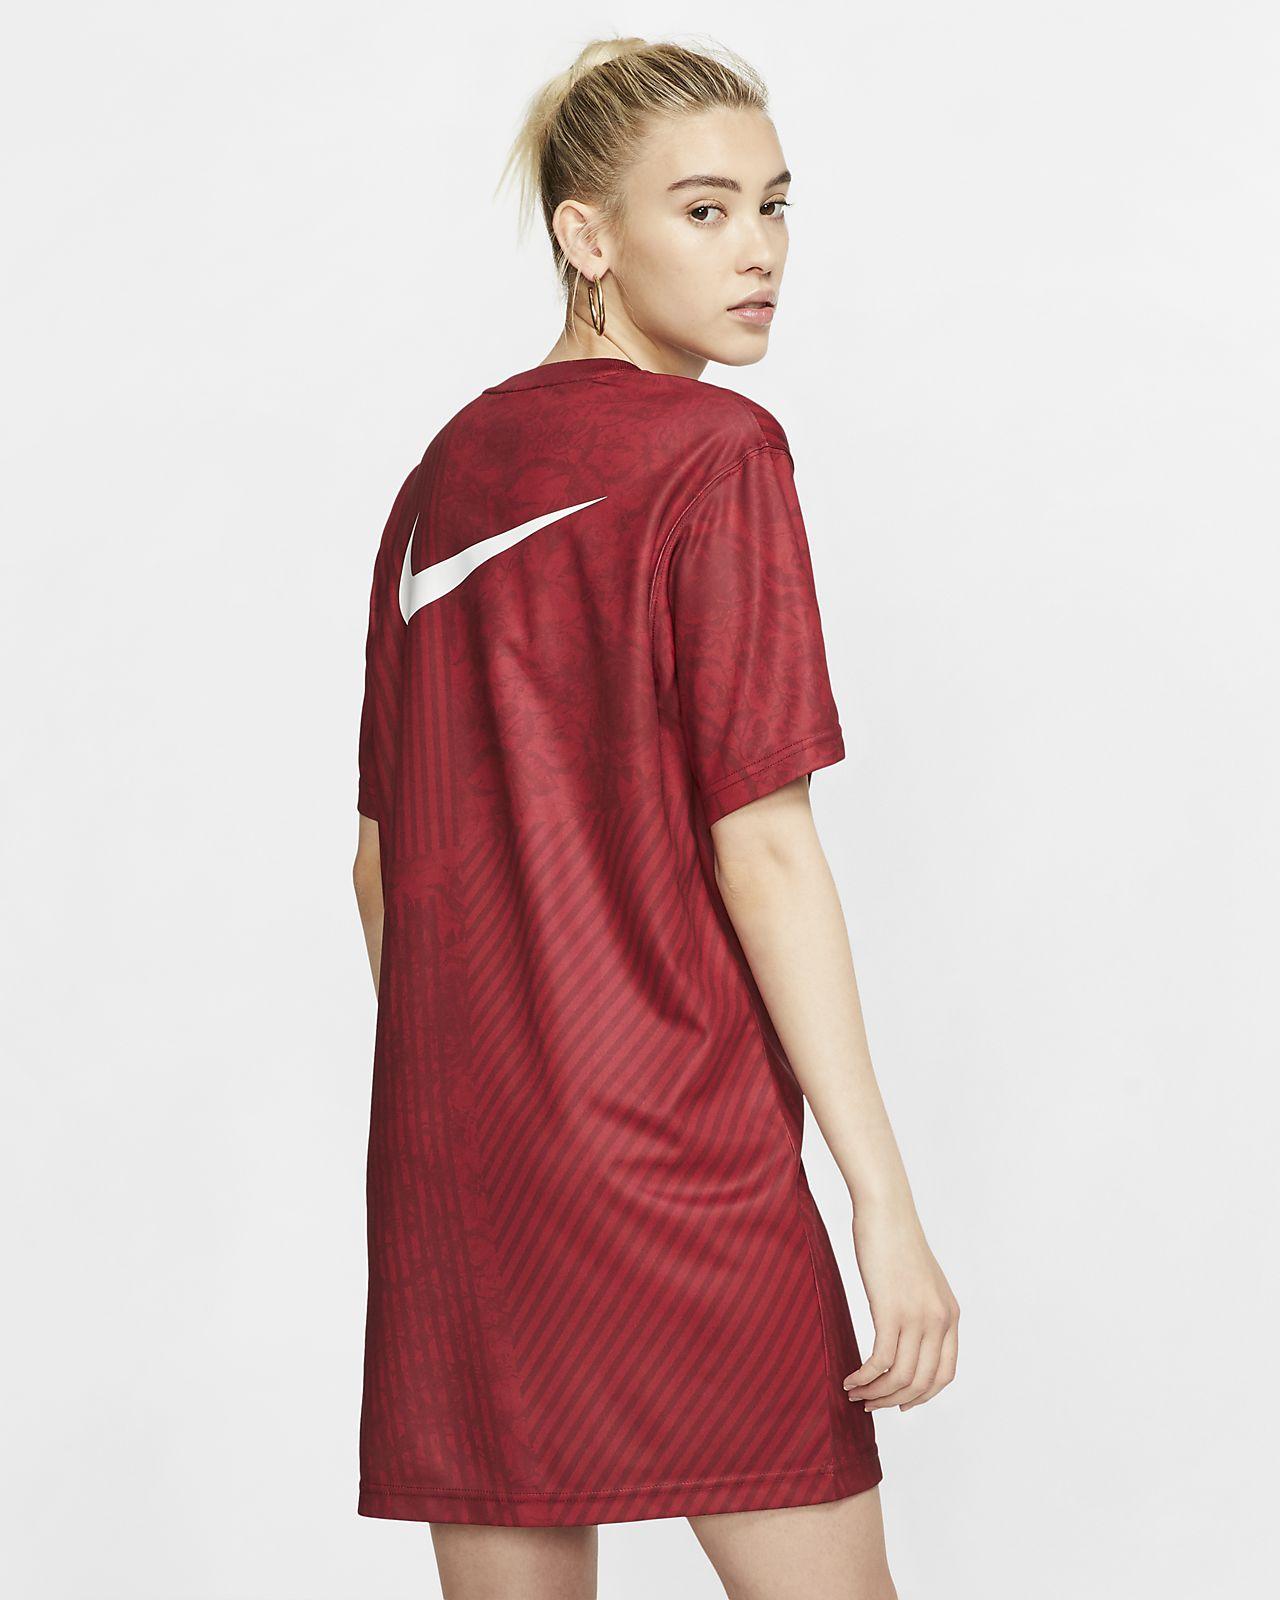 be72c1c3b039 Nike Sportswear Unité Totale női ruha. Nike.com HU